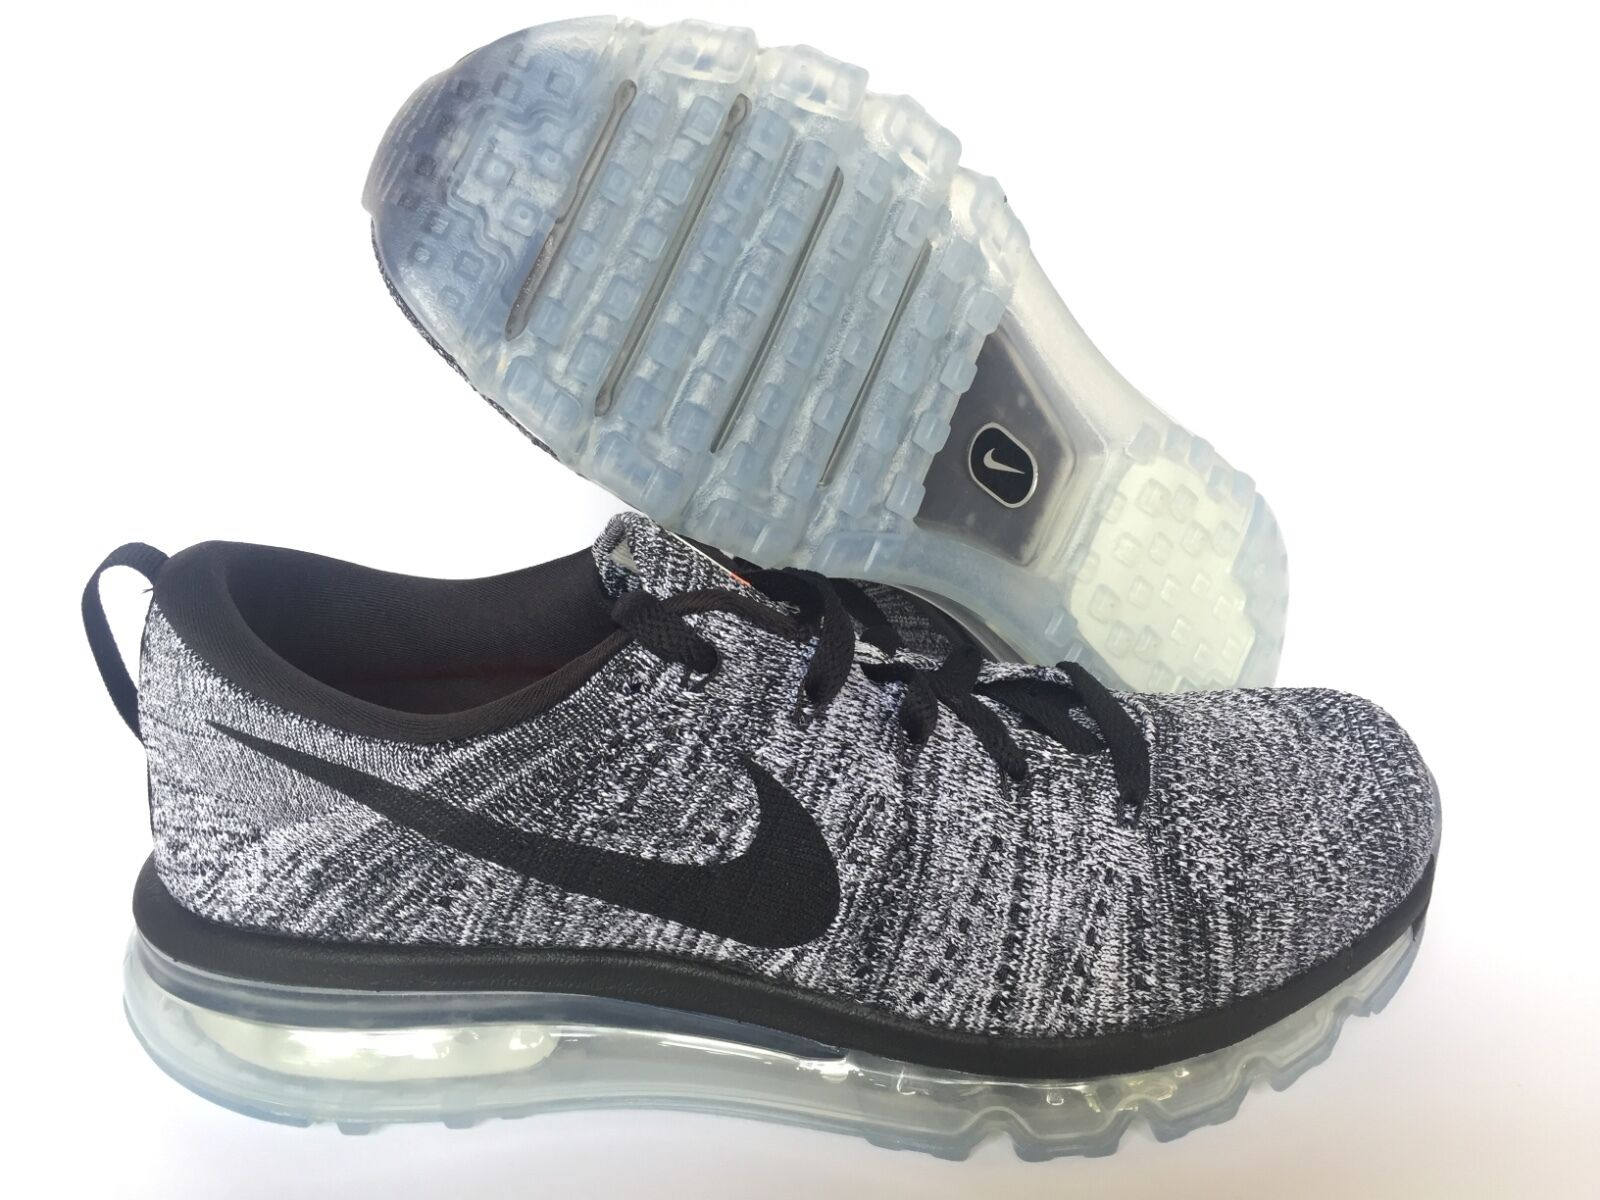 Nike Air Max Flyknit NEW schwarz Weiß   US MEN SZ 7